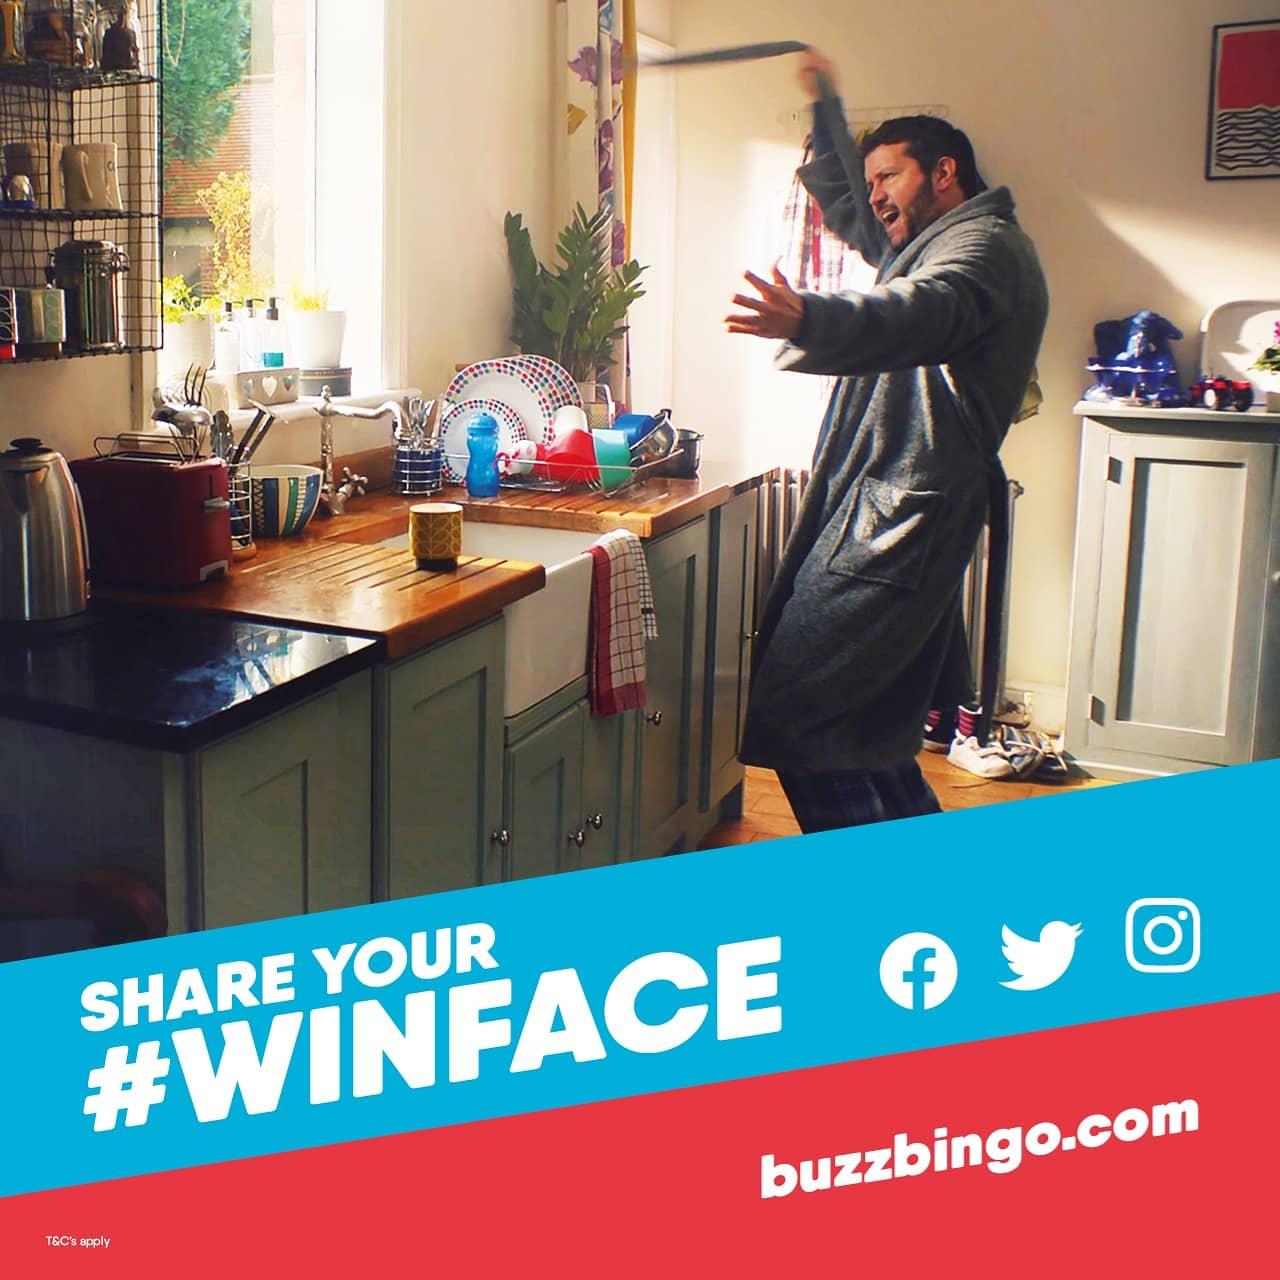 Buzz Bingo Unveils #WinFace Marketing Campaign